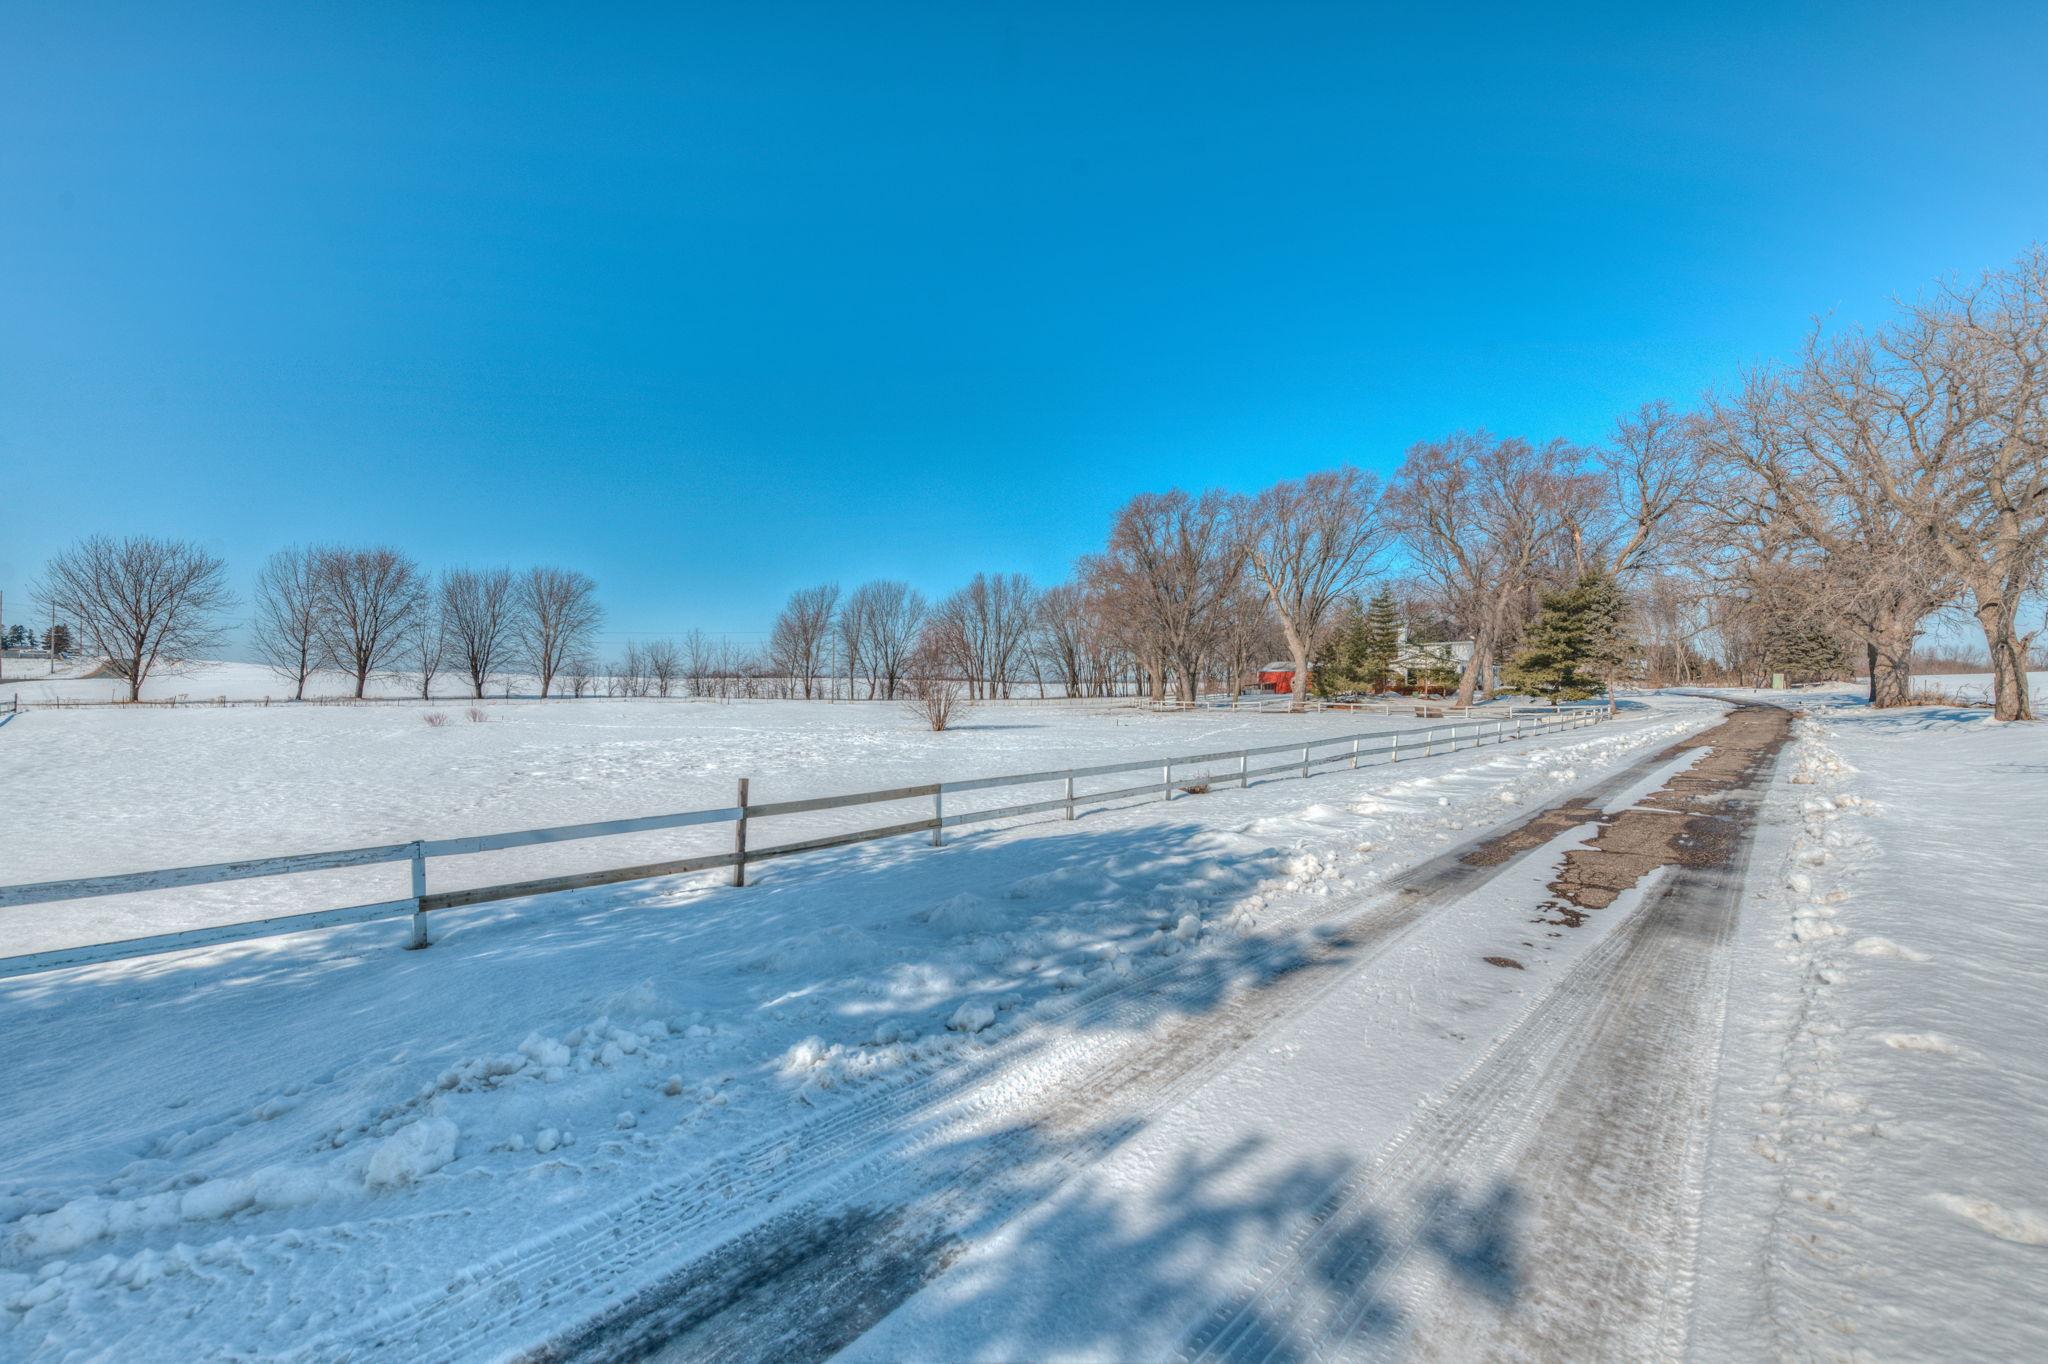 Driveway/Pasture